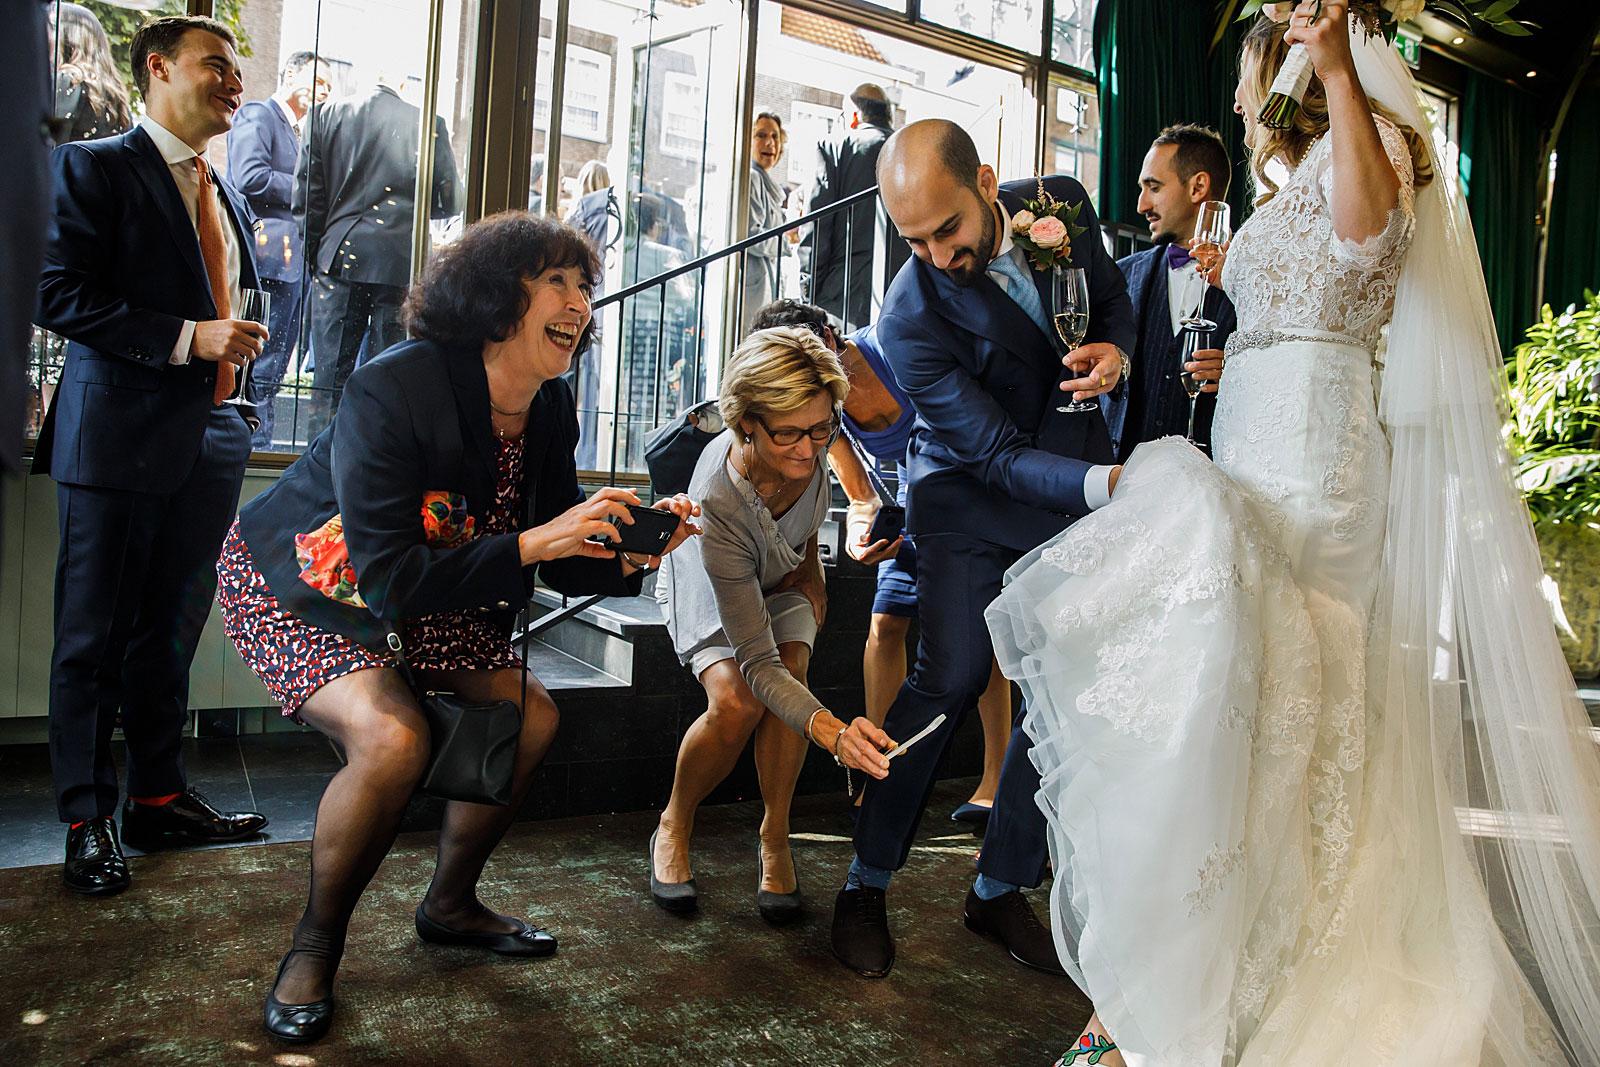 43-wedding-reception-pulitzer-hotel-amsterdam